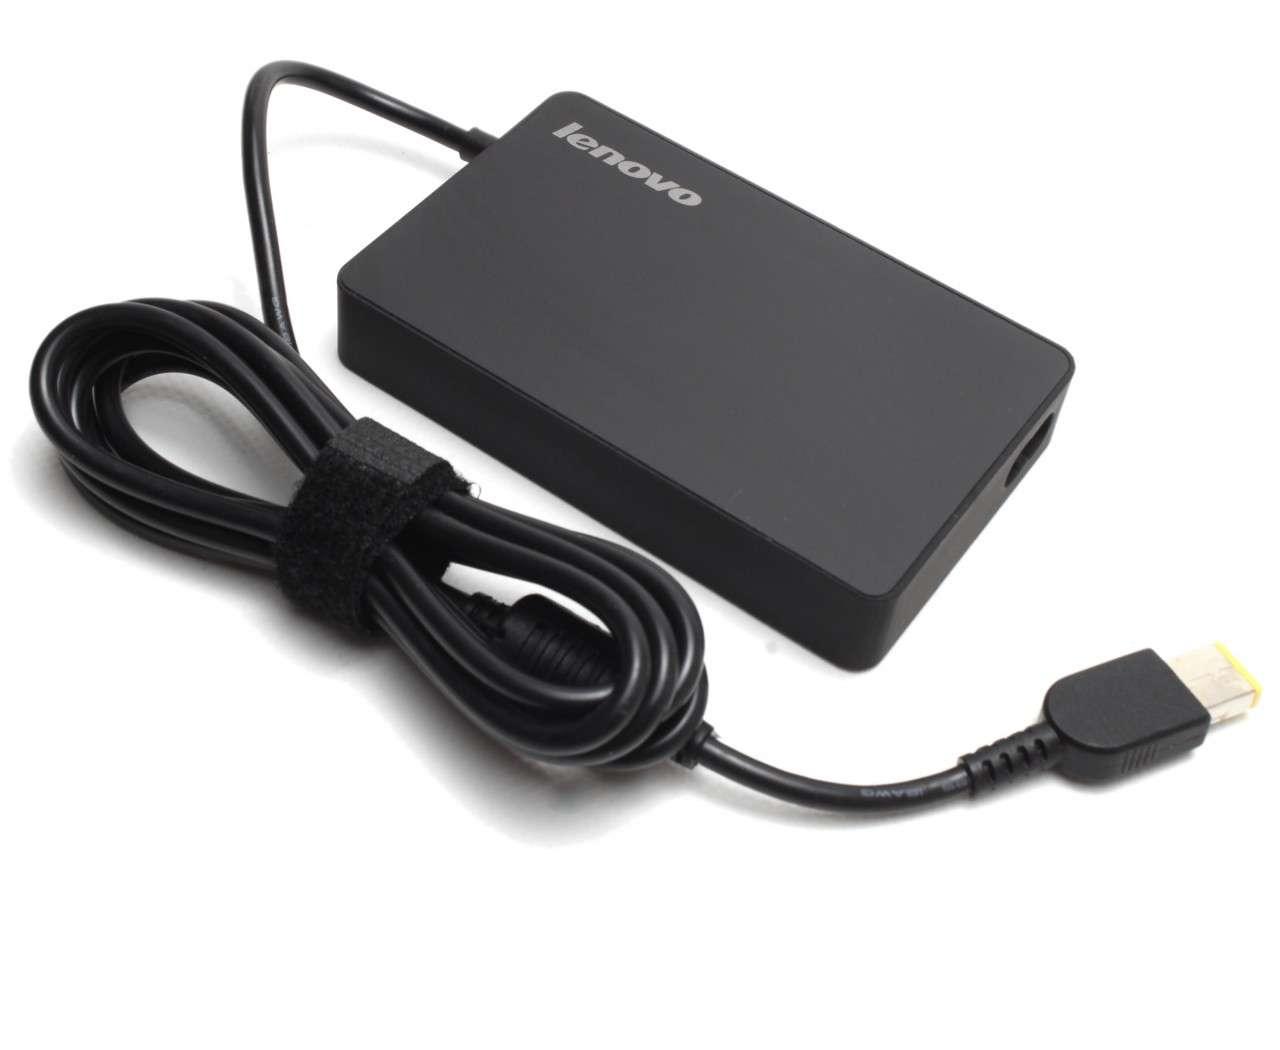 Incarcator Lenovo ThinkPad E570 20H6 65W Slim Version imagine